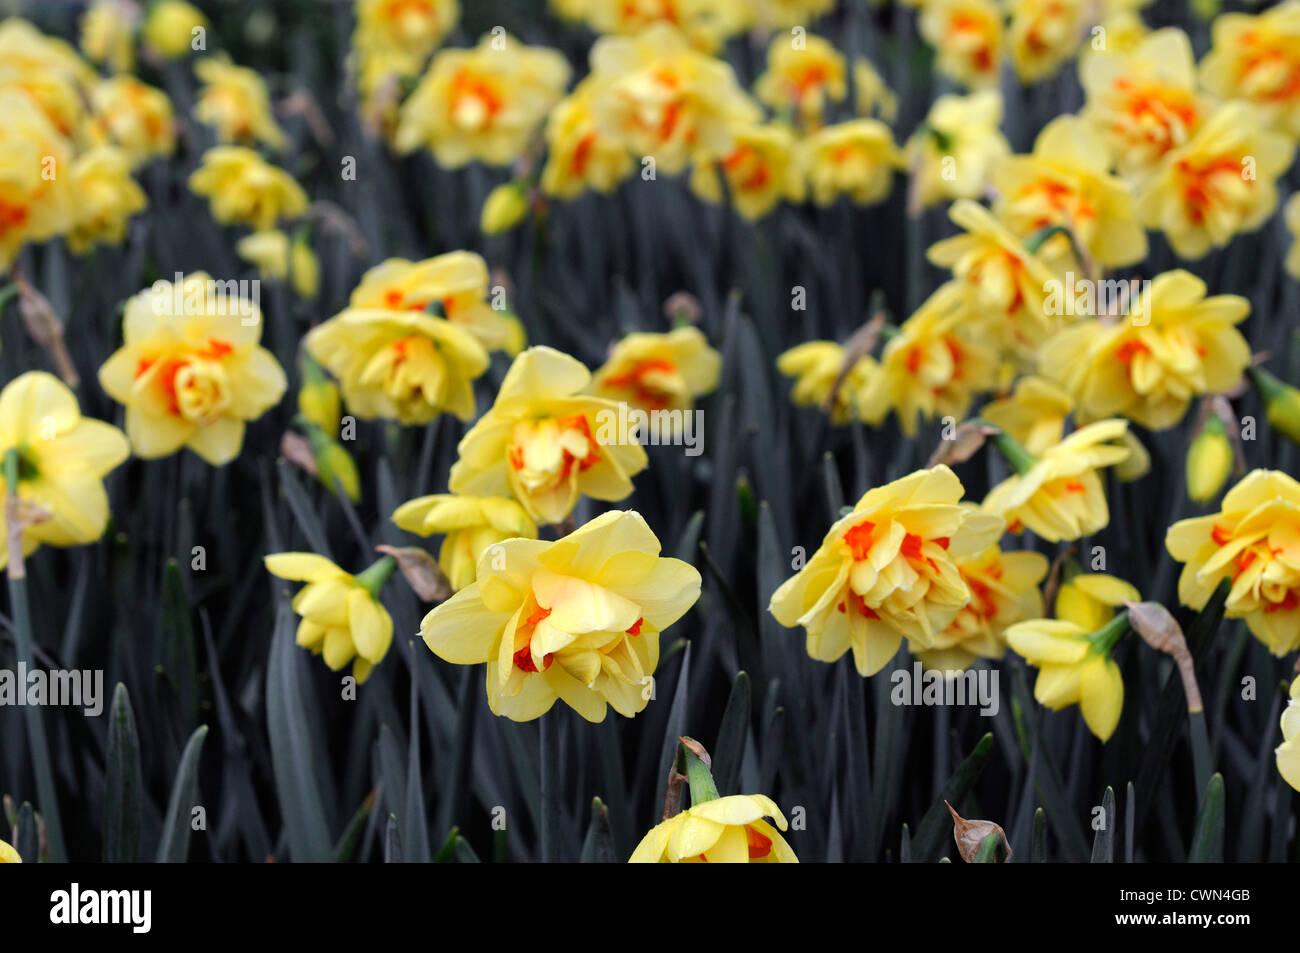 Narcisse Tahiti Orange Jaune Petales Portraits De Plantes Fleurs